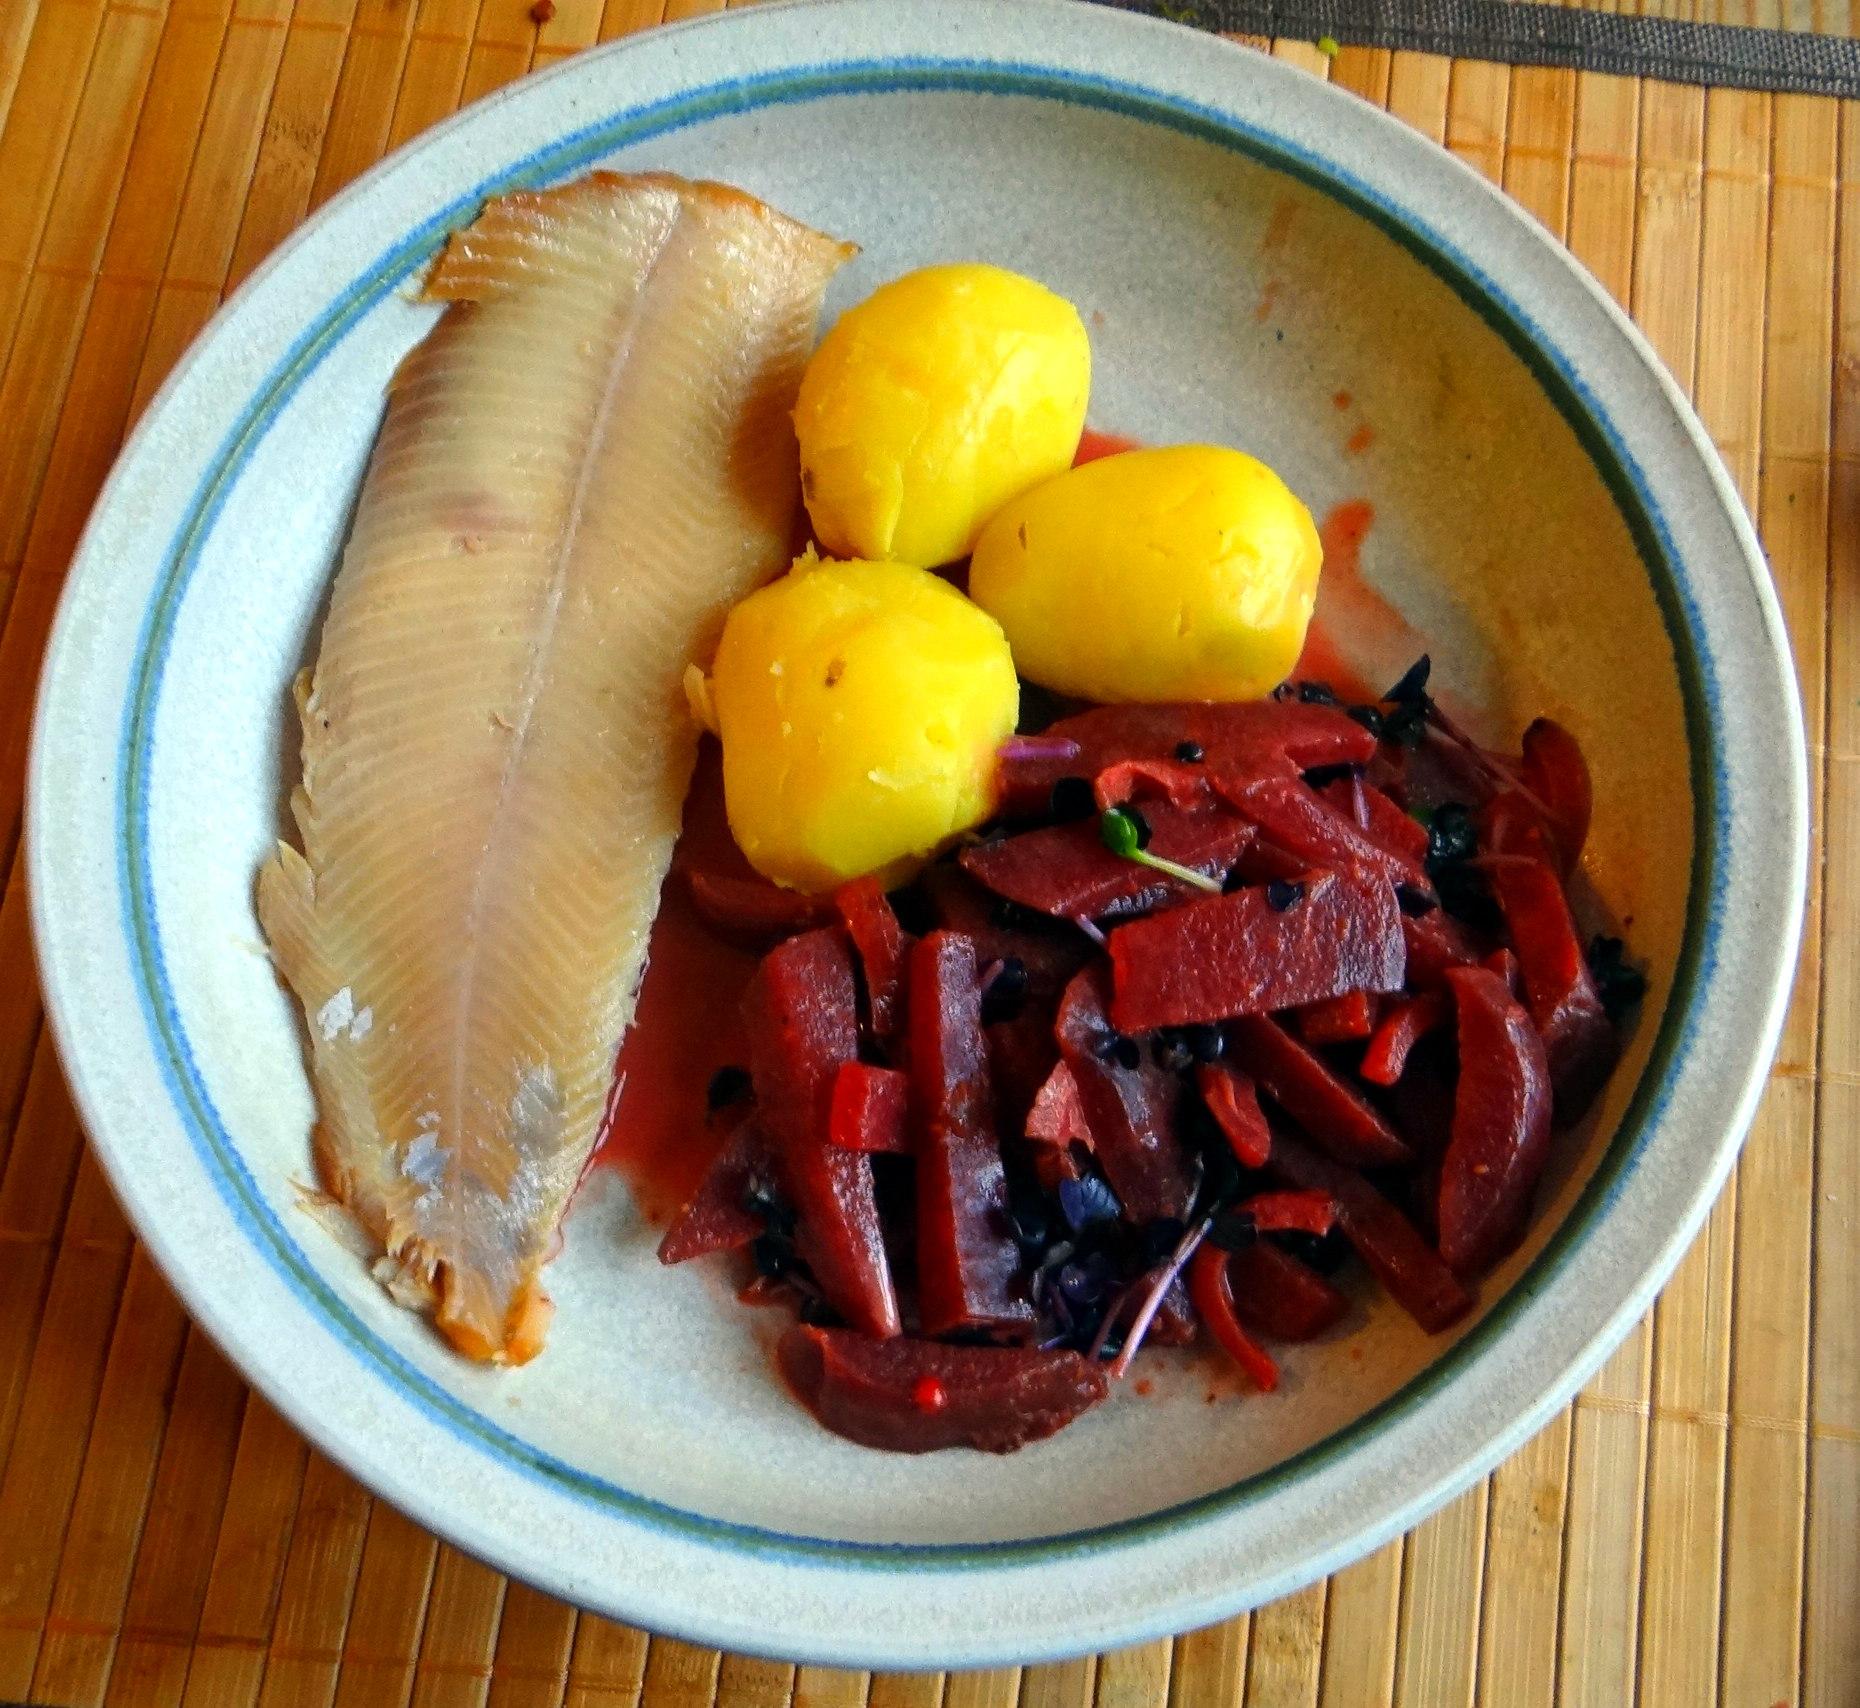 Rote Beete Gemüse,Geräucherte Forelle,Kartoffeln,Obstsalat (14)